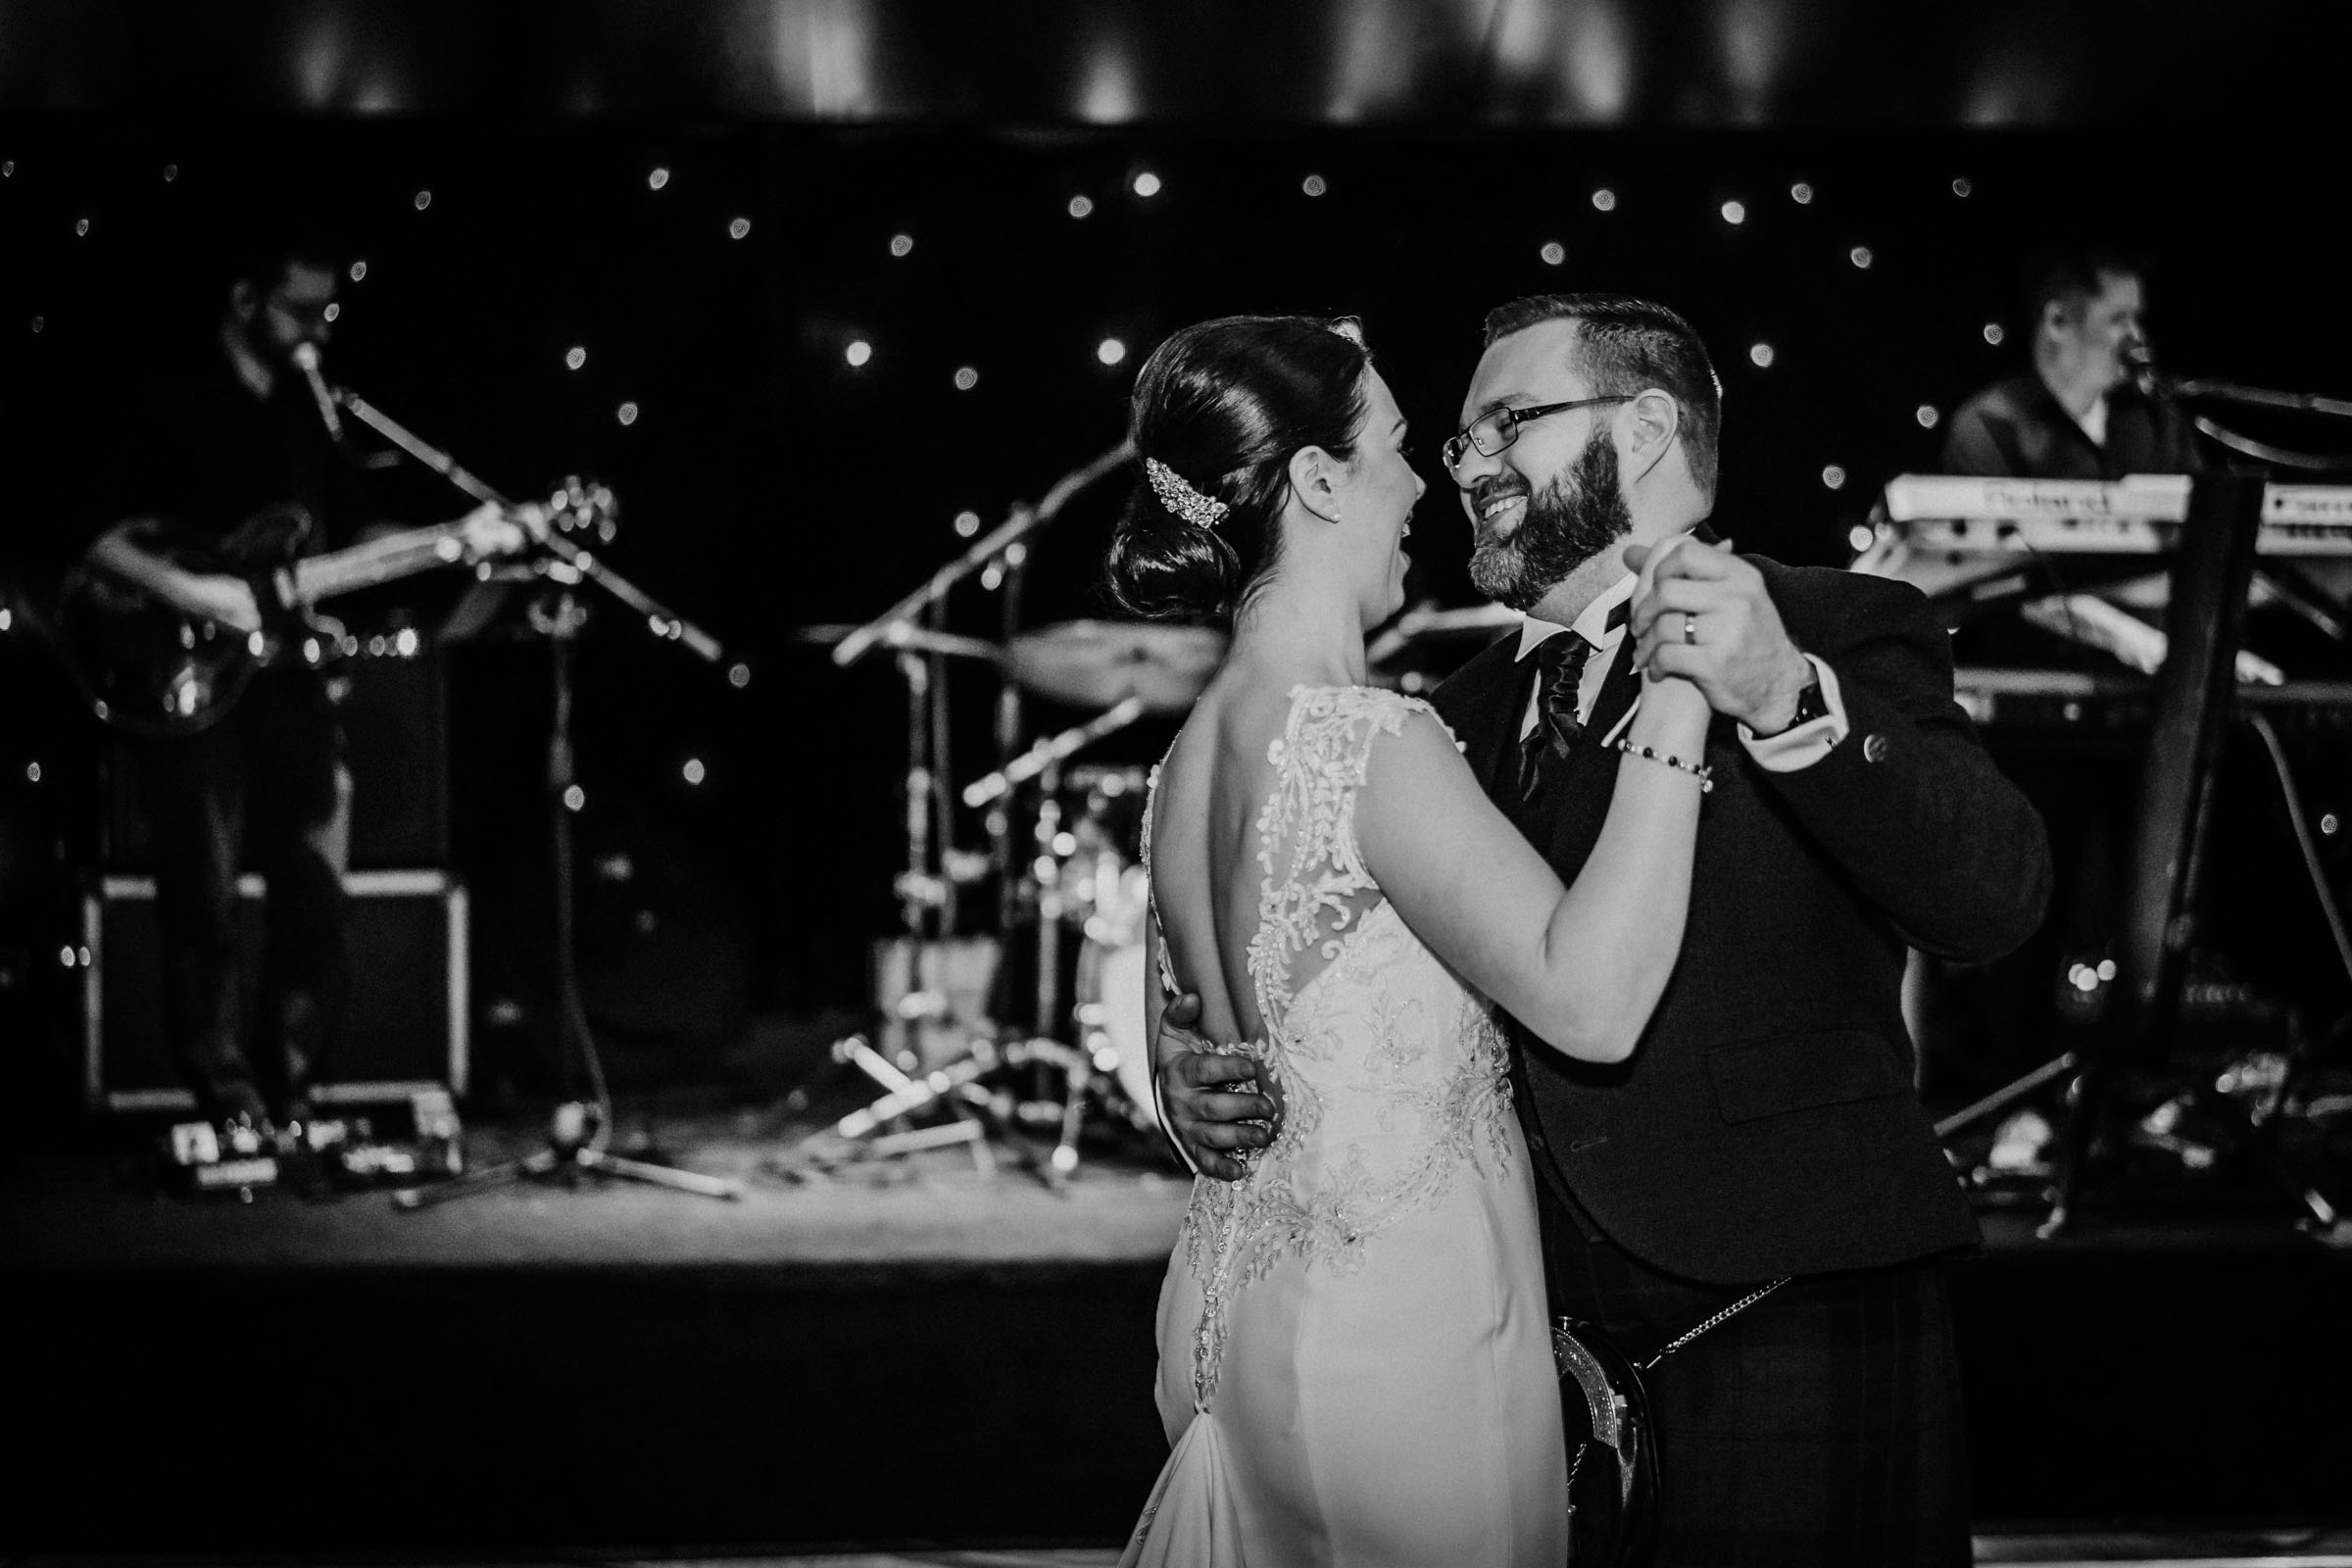 Radstone-Wedding-Dearly-Photography-Scotland (45 of 50).jpg